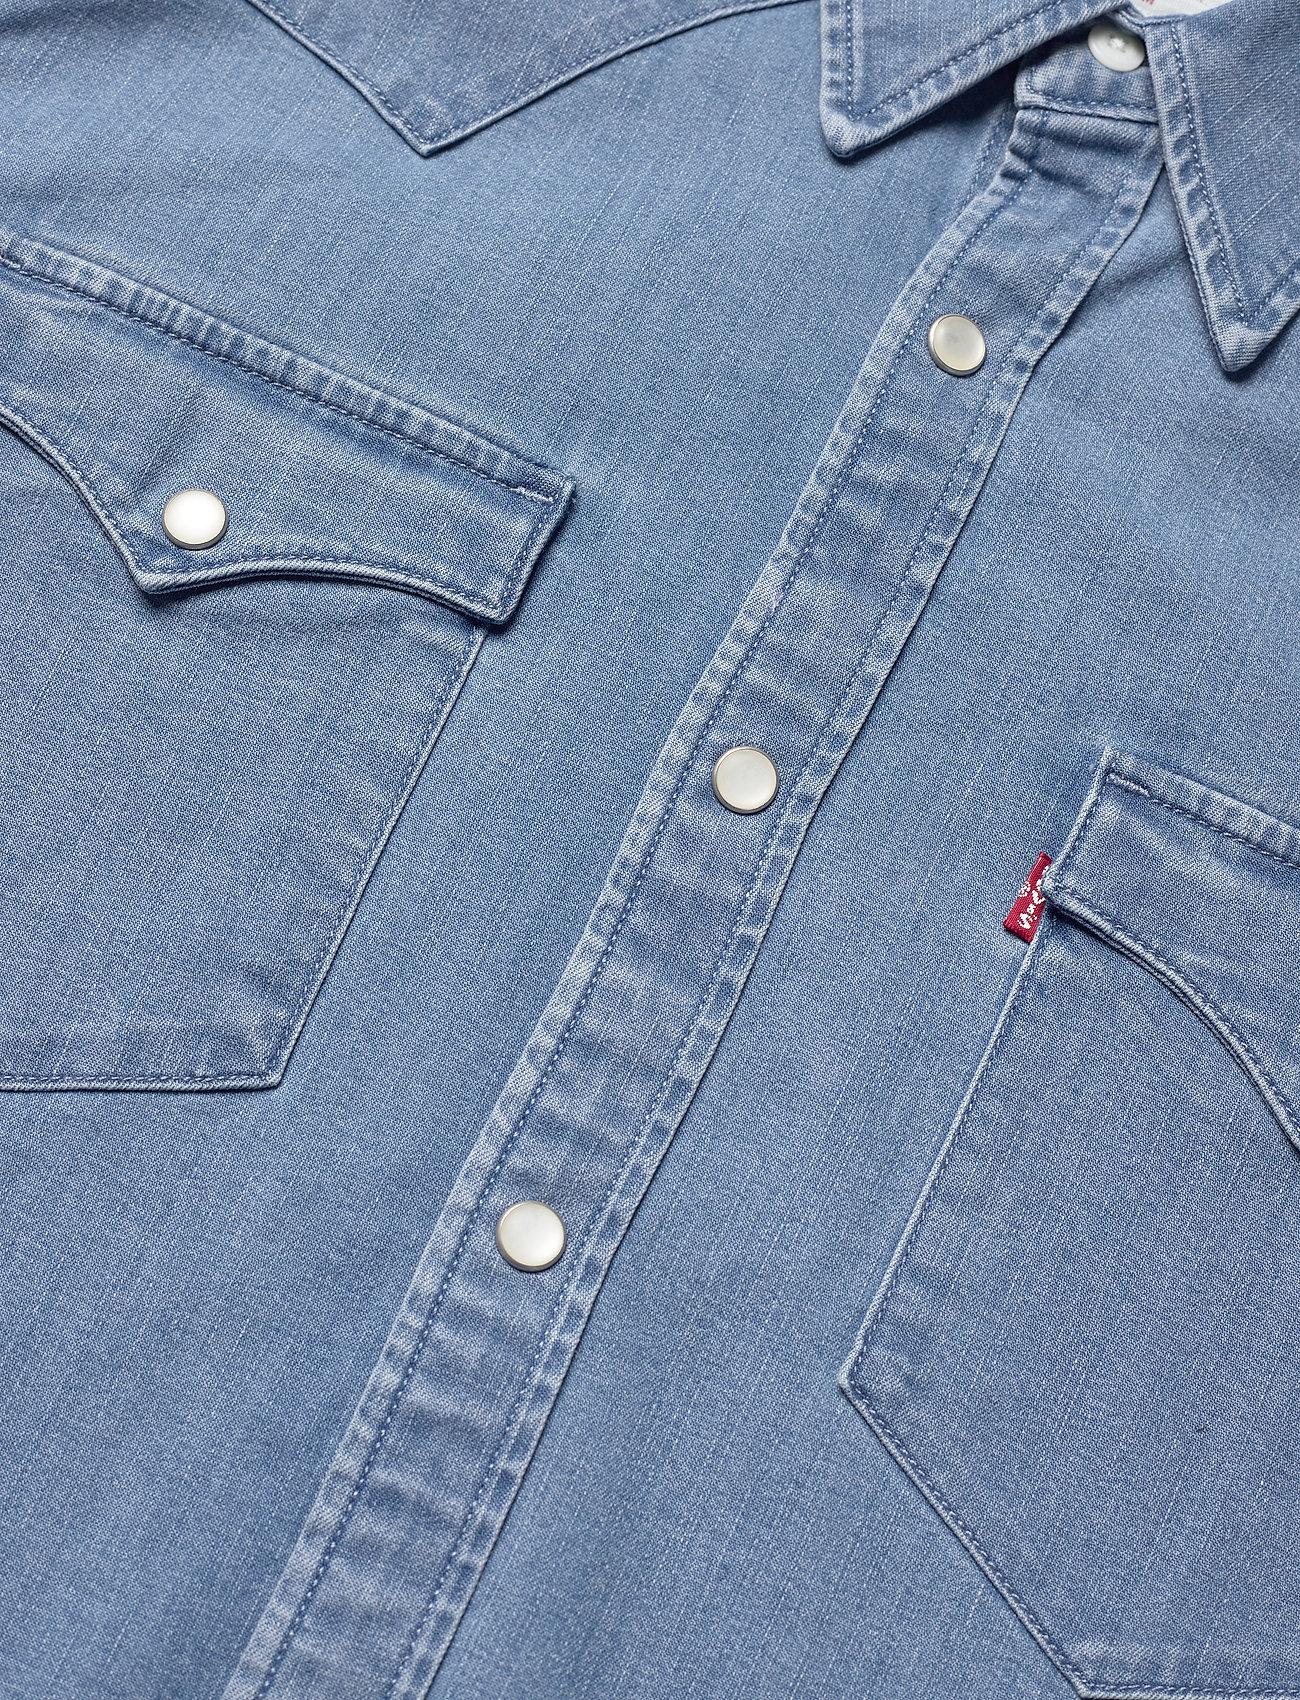 LEVI´S Men - BARSTOW WESTERN STANDARD AUTHE - chemises de lin - light indigo - worn in - 3